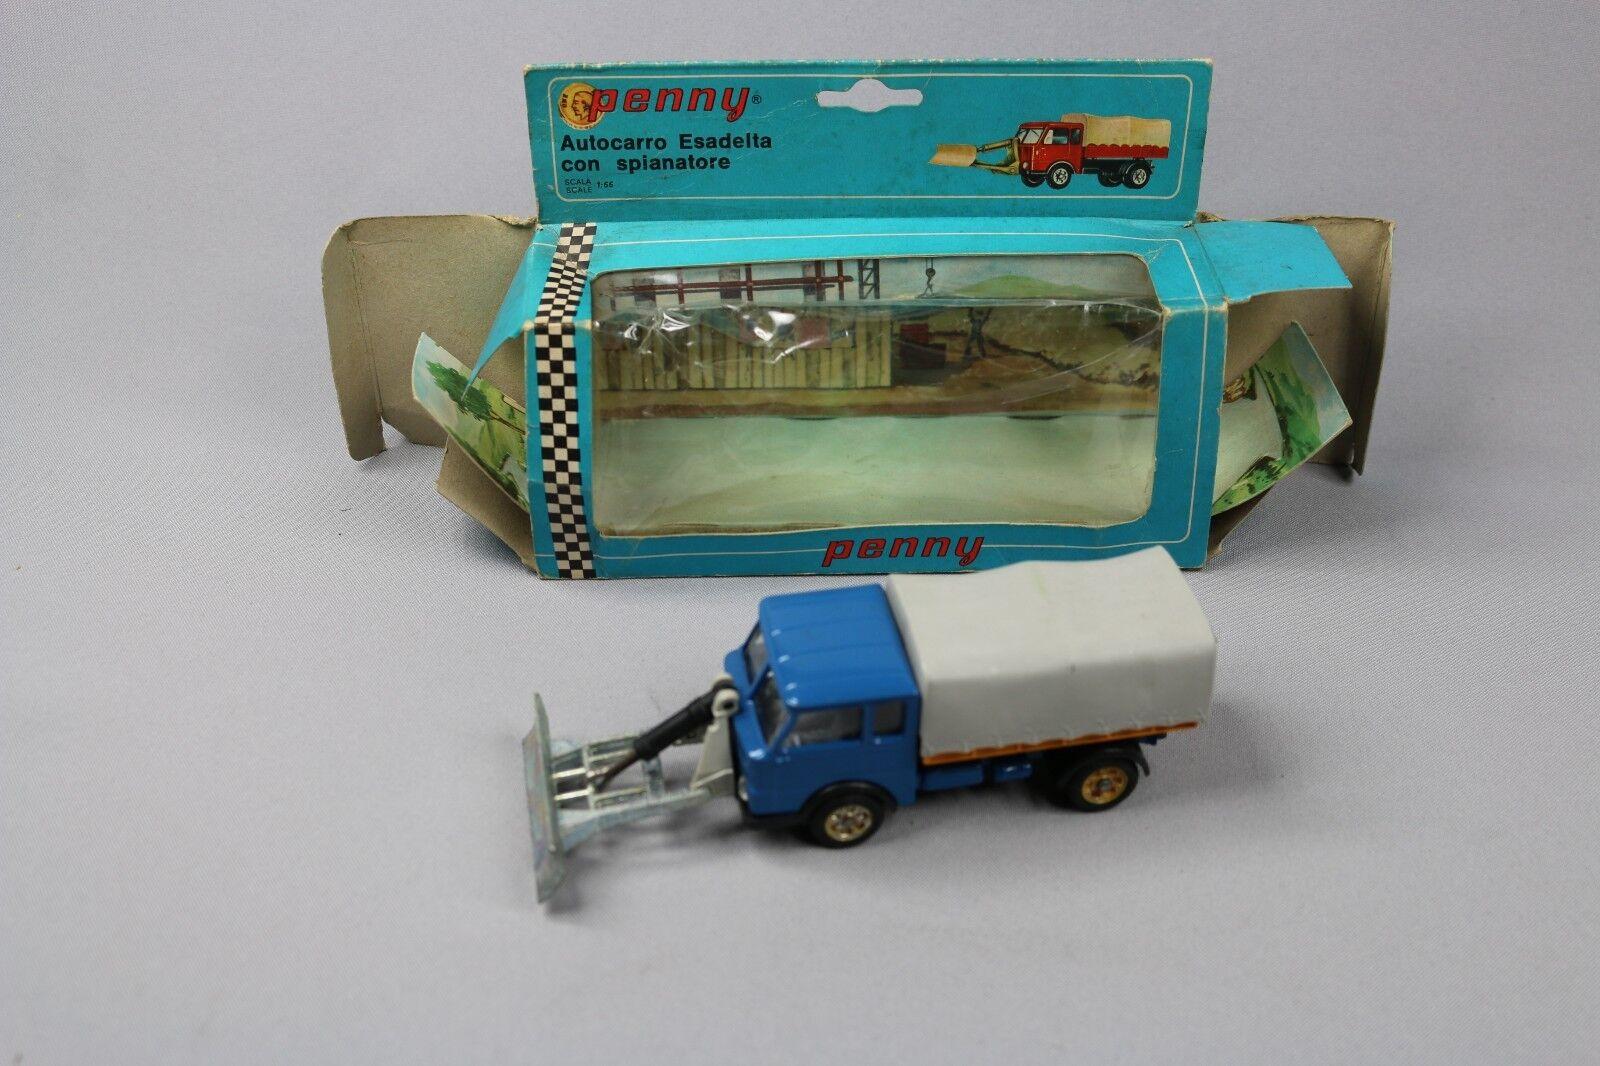 ZC1113 Penny Penny Penny 0 114 Camion Miniature 1 66 Esadelta Autocarro con Spianatore 78be72